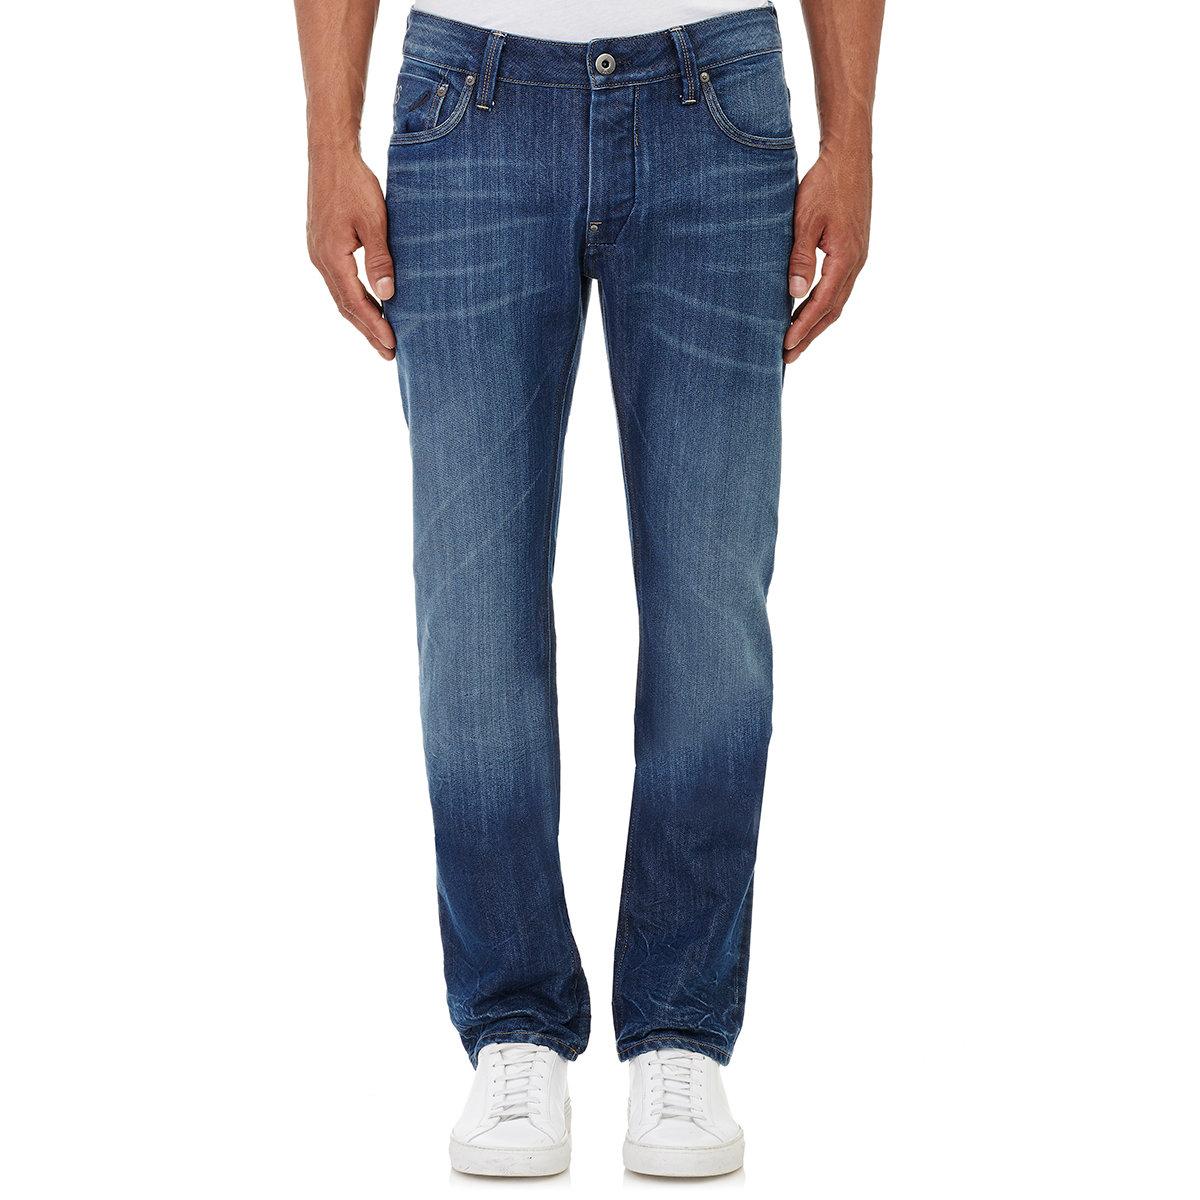 g star raw men 39 s attacc straight leg jeans in blue for men. Black Bedroom Furniture Sets. Home Design Ideas